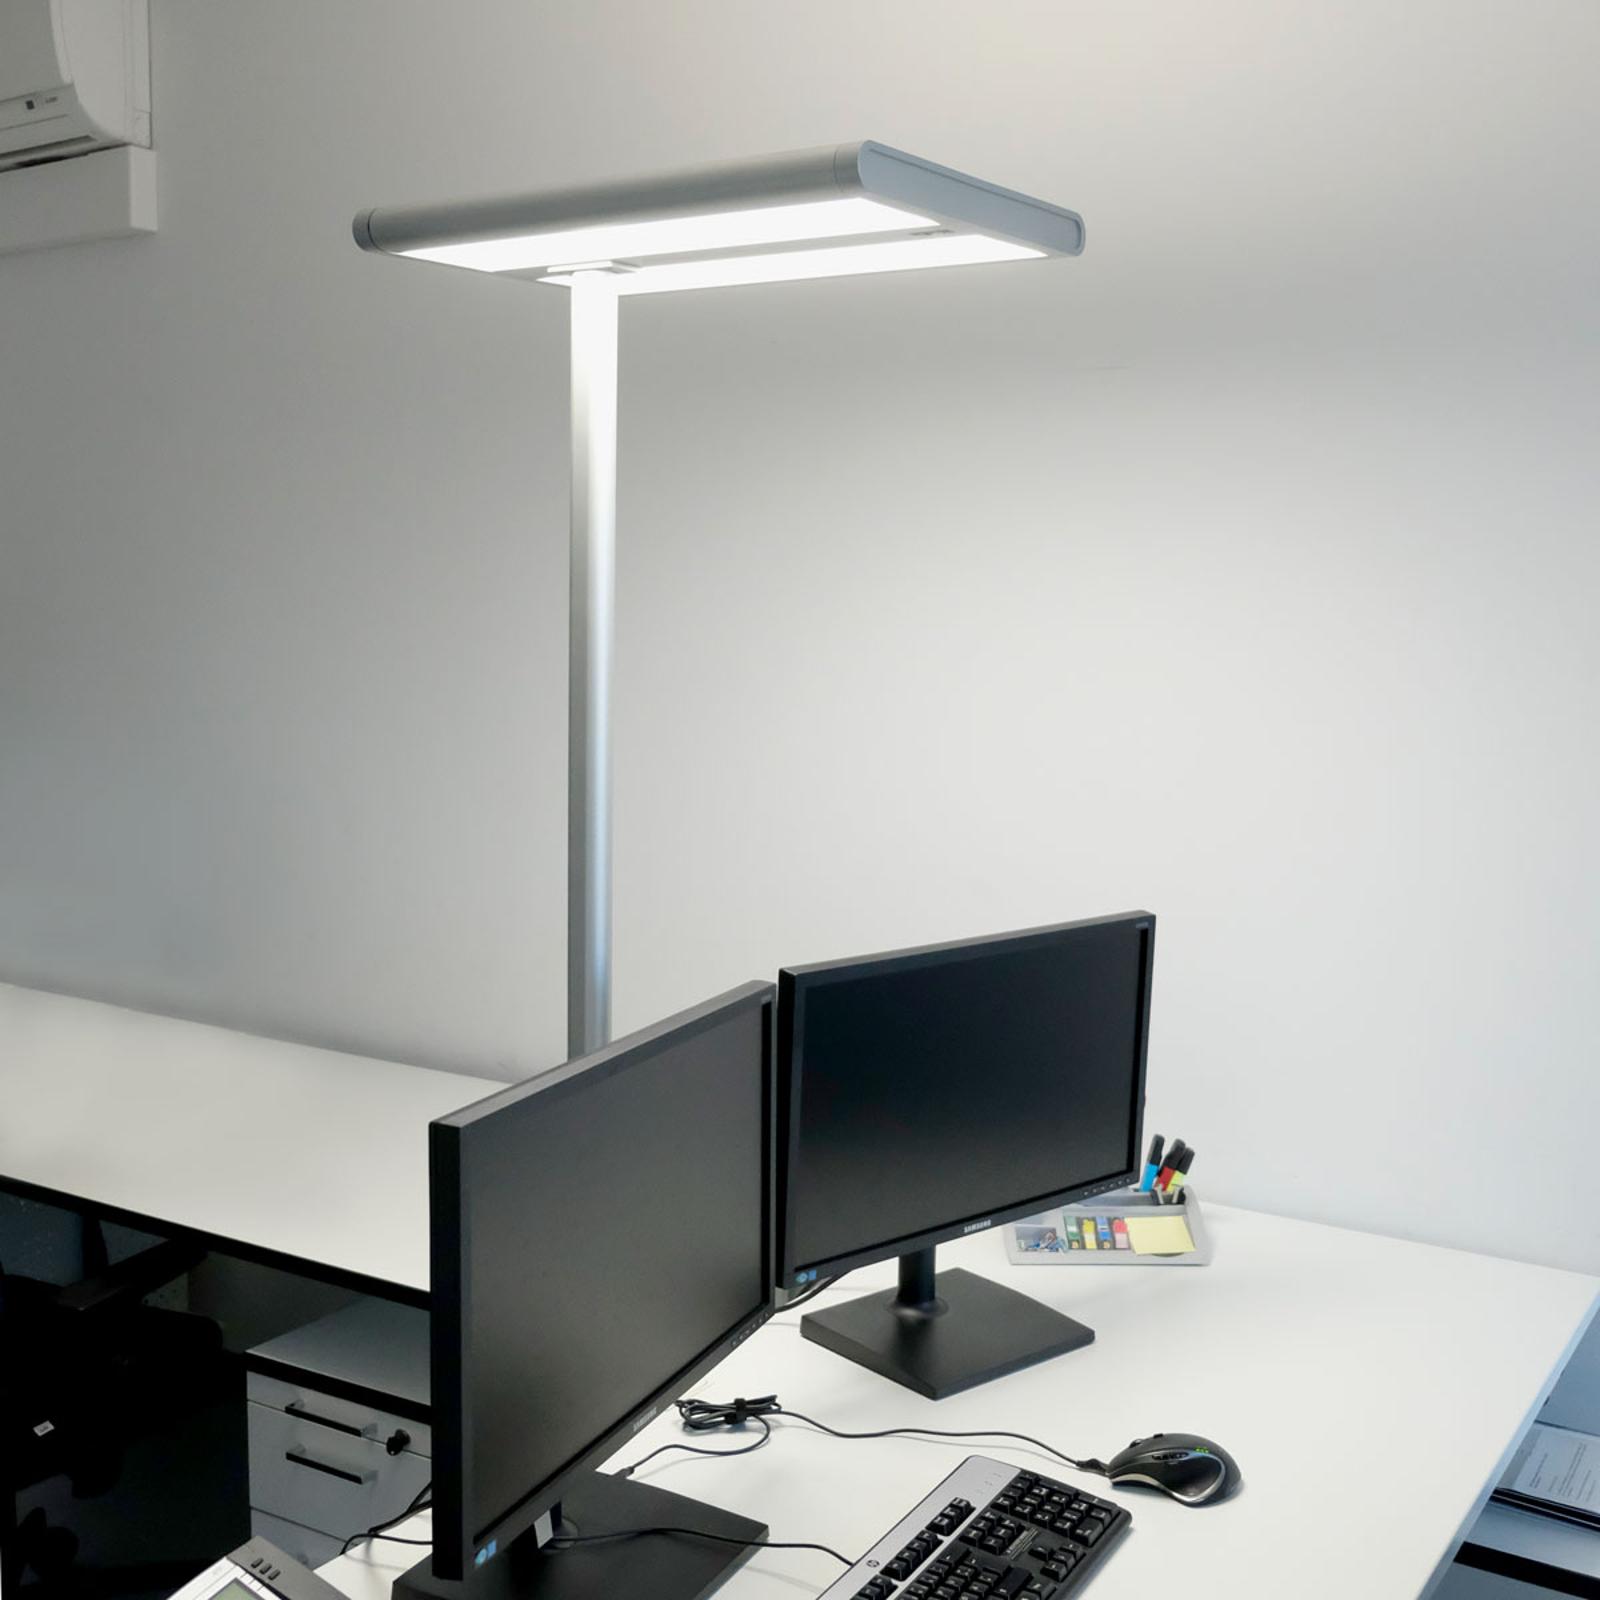 Quirin - LED-Büro-Stehlampe mit Tageslichtsensor